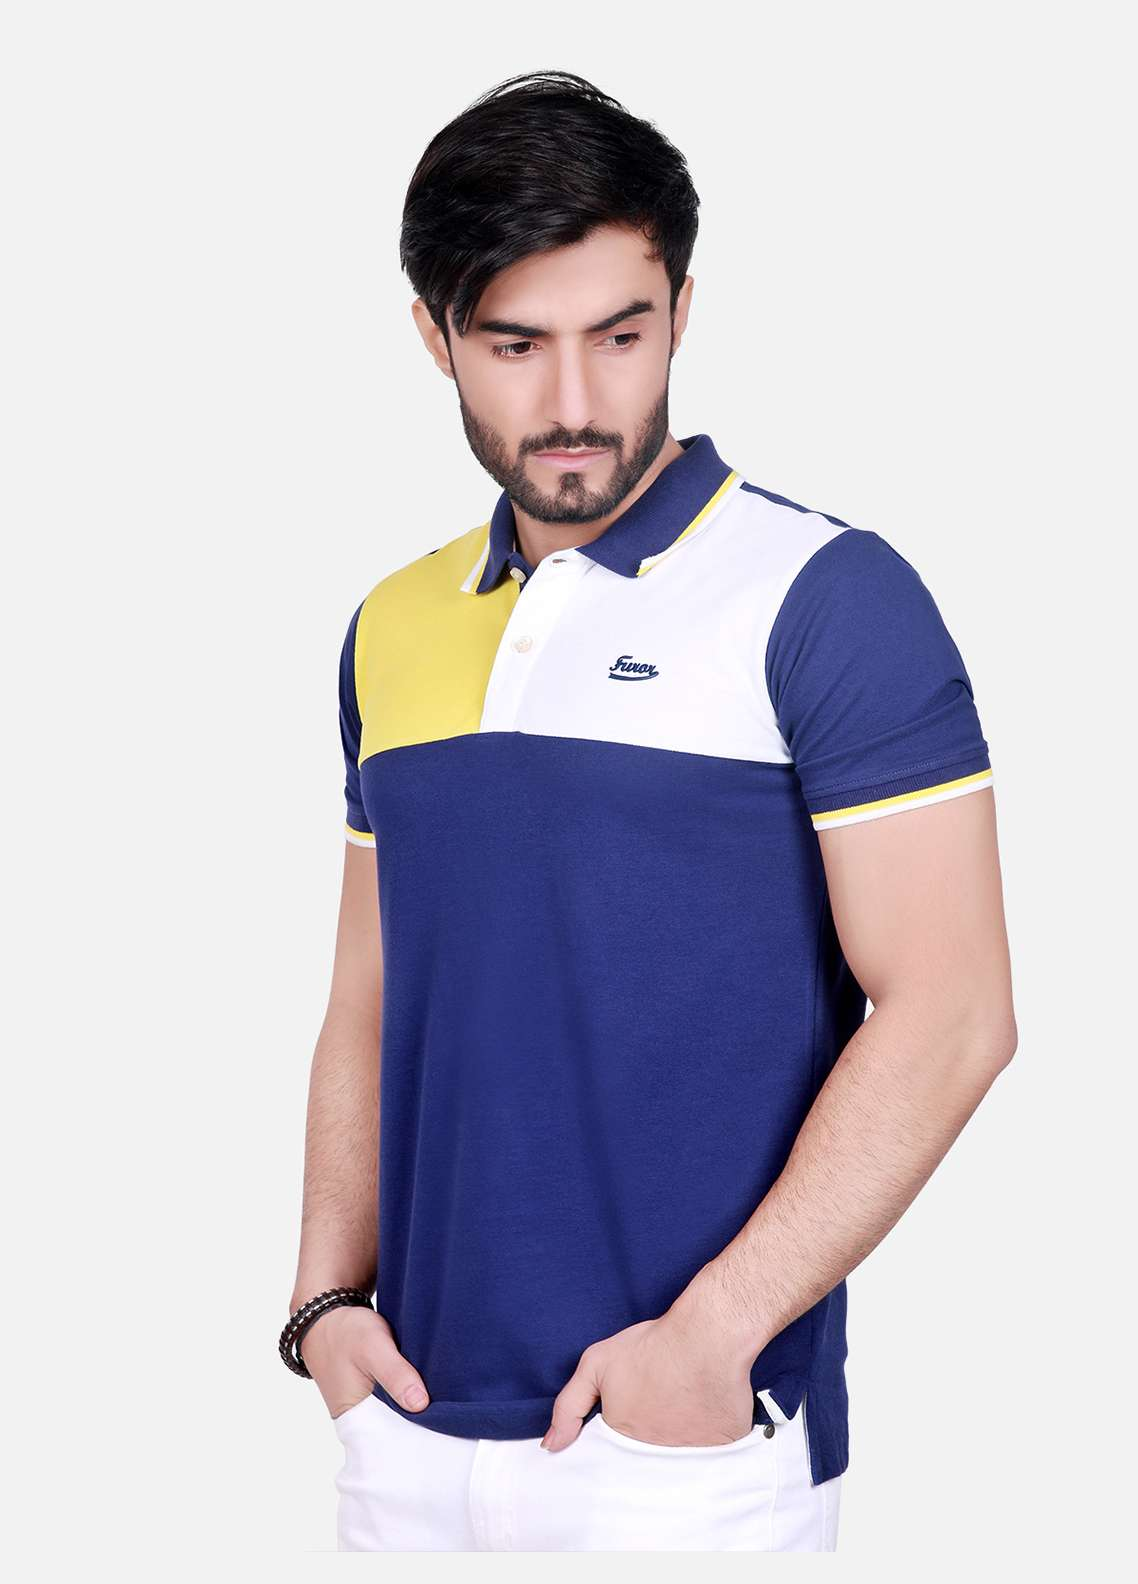 Furor Cotton Polo T-Shirts for Men - Blue FRM18PS 005